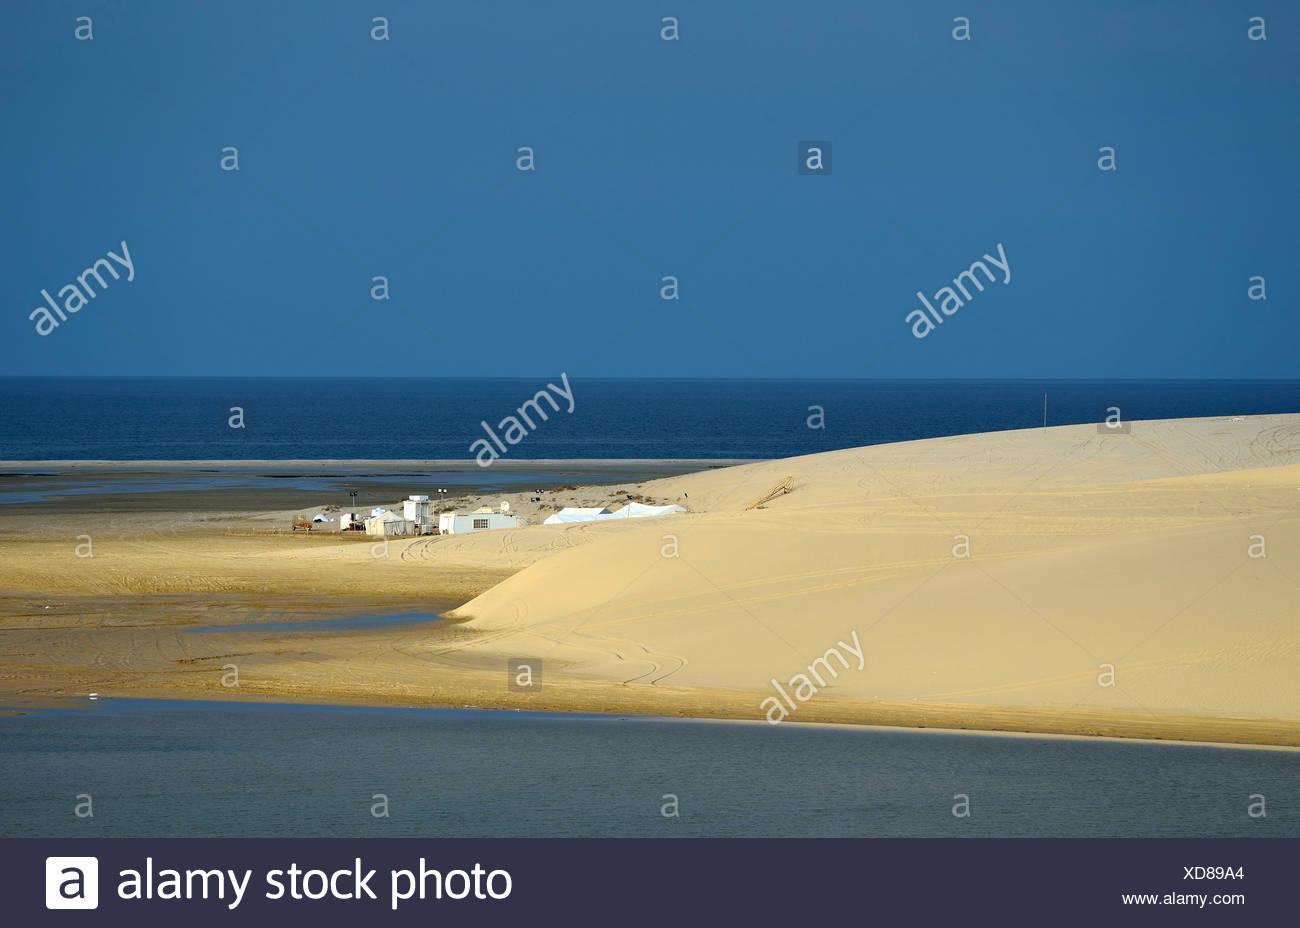 Bedouin tents, sand dune, Inland Sea, desert miracle of Qatar, Khor Al Udeid Beach, auch Khor El Deid, Inland Sea - Stock Image